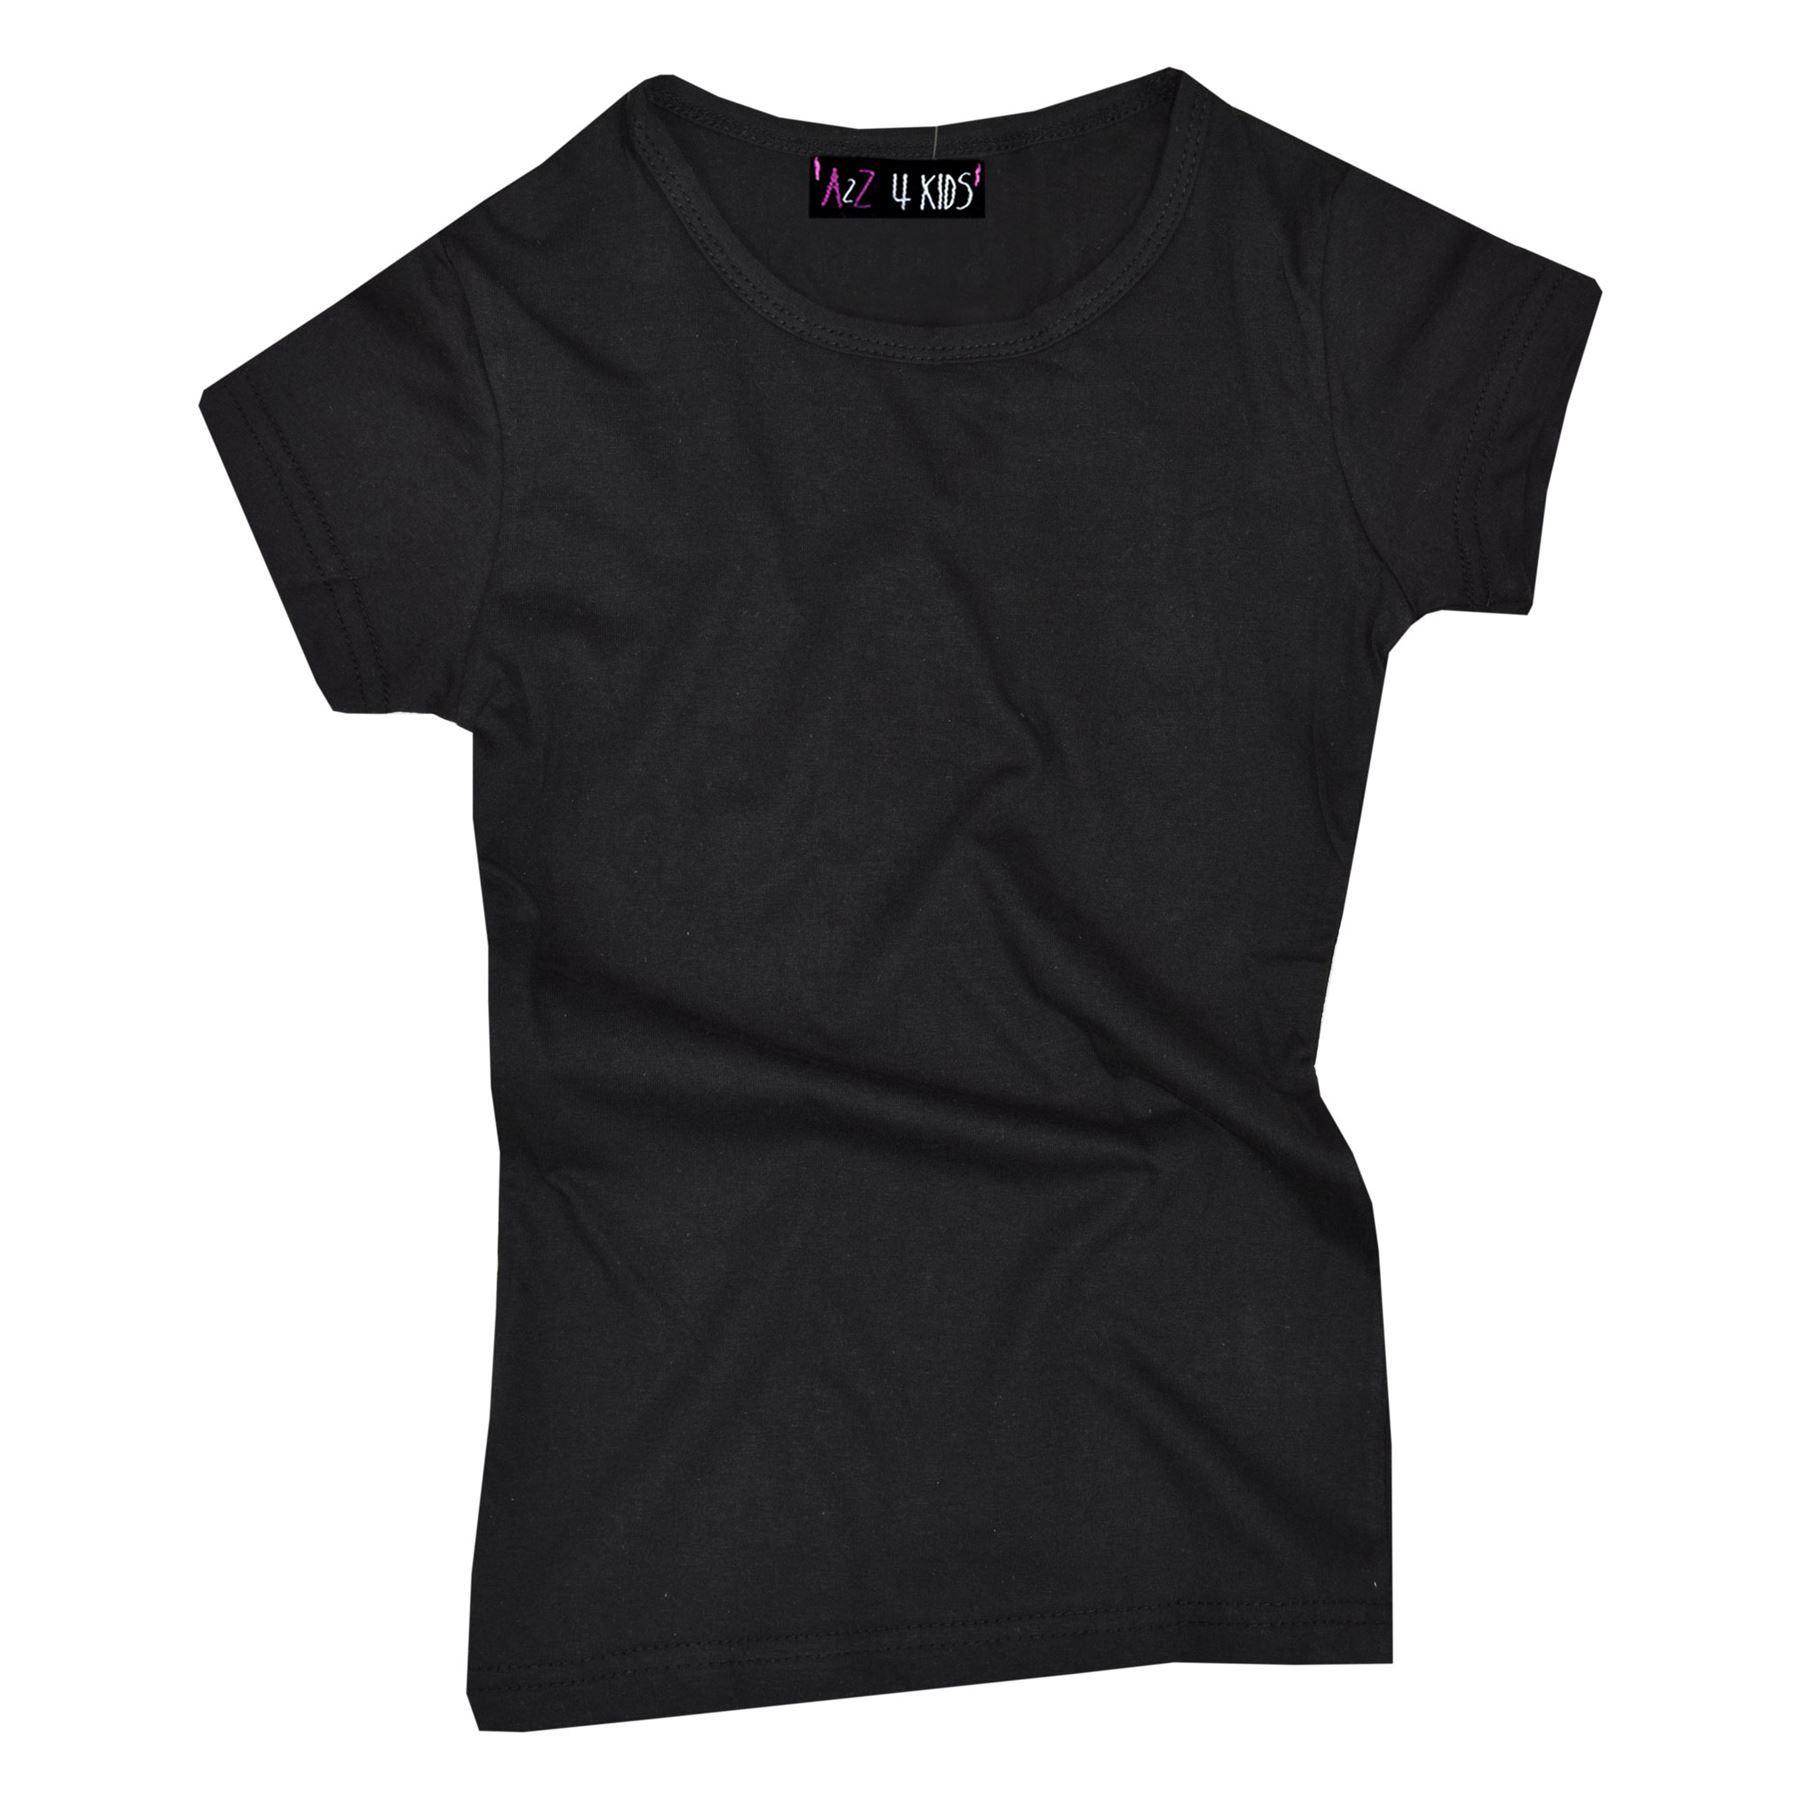 Kids-Girls-T-Shirts-Designer-100-Cotton-Plain-School-T-Shirt-Top-New-Age-3-13Yr thumbnail 8